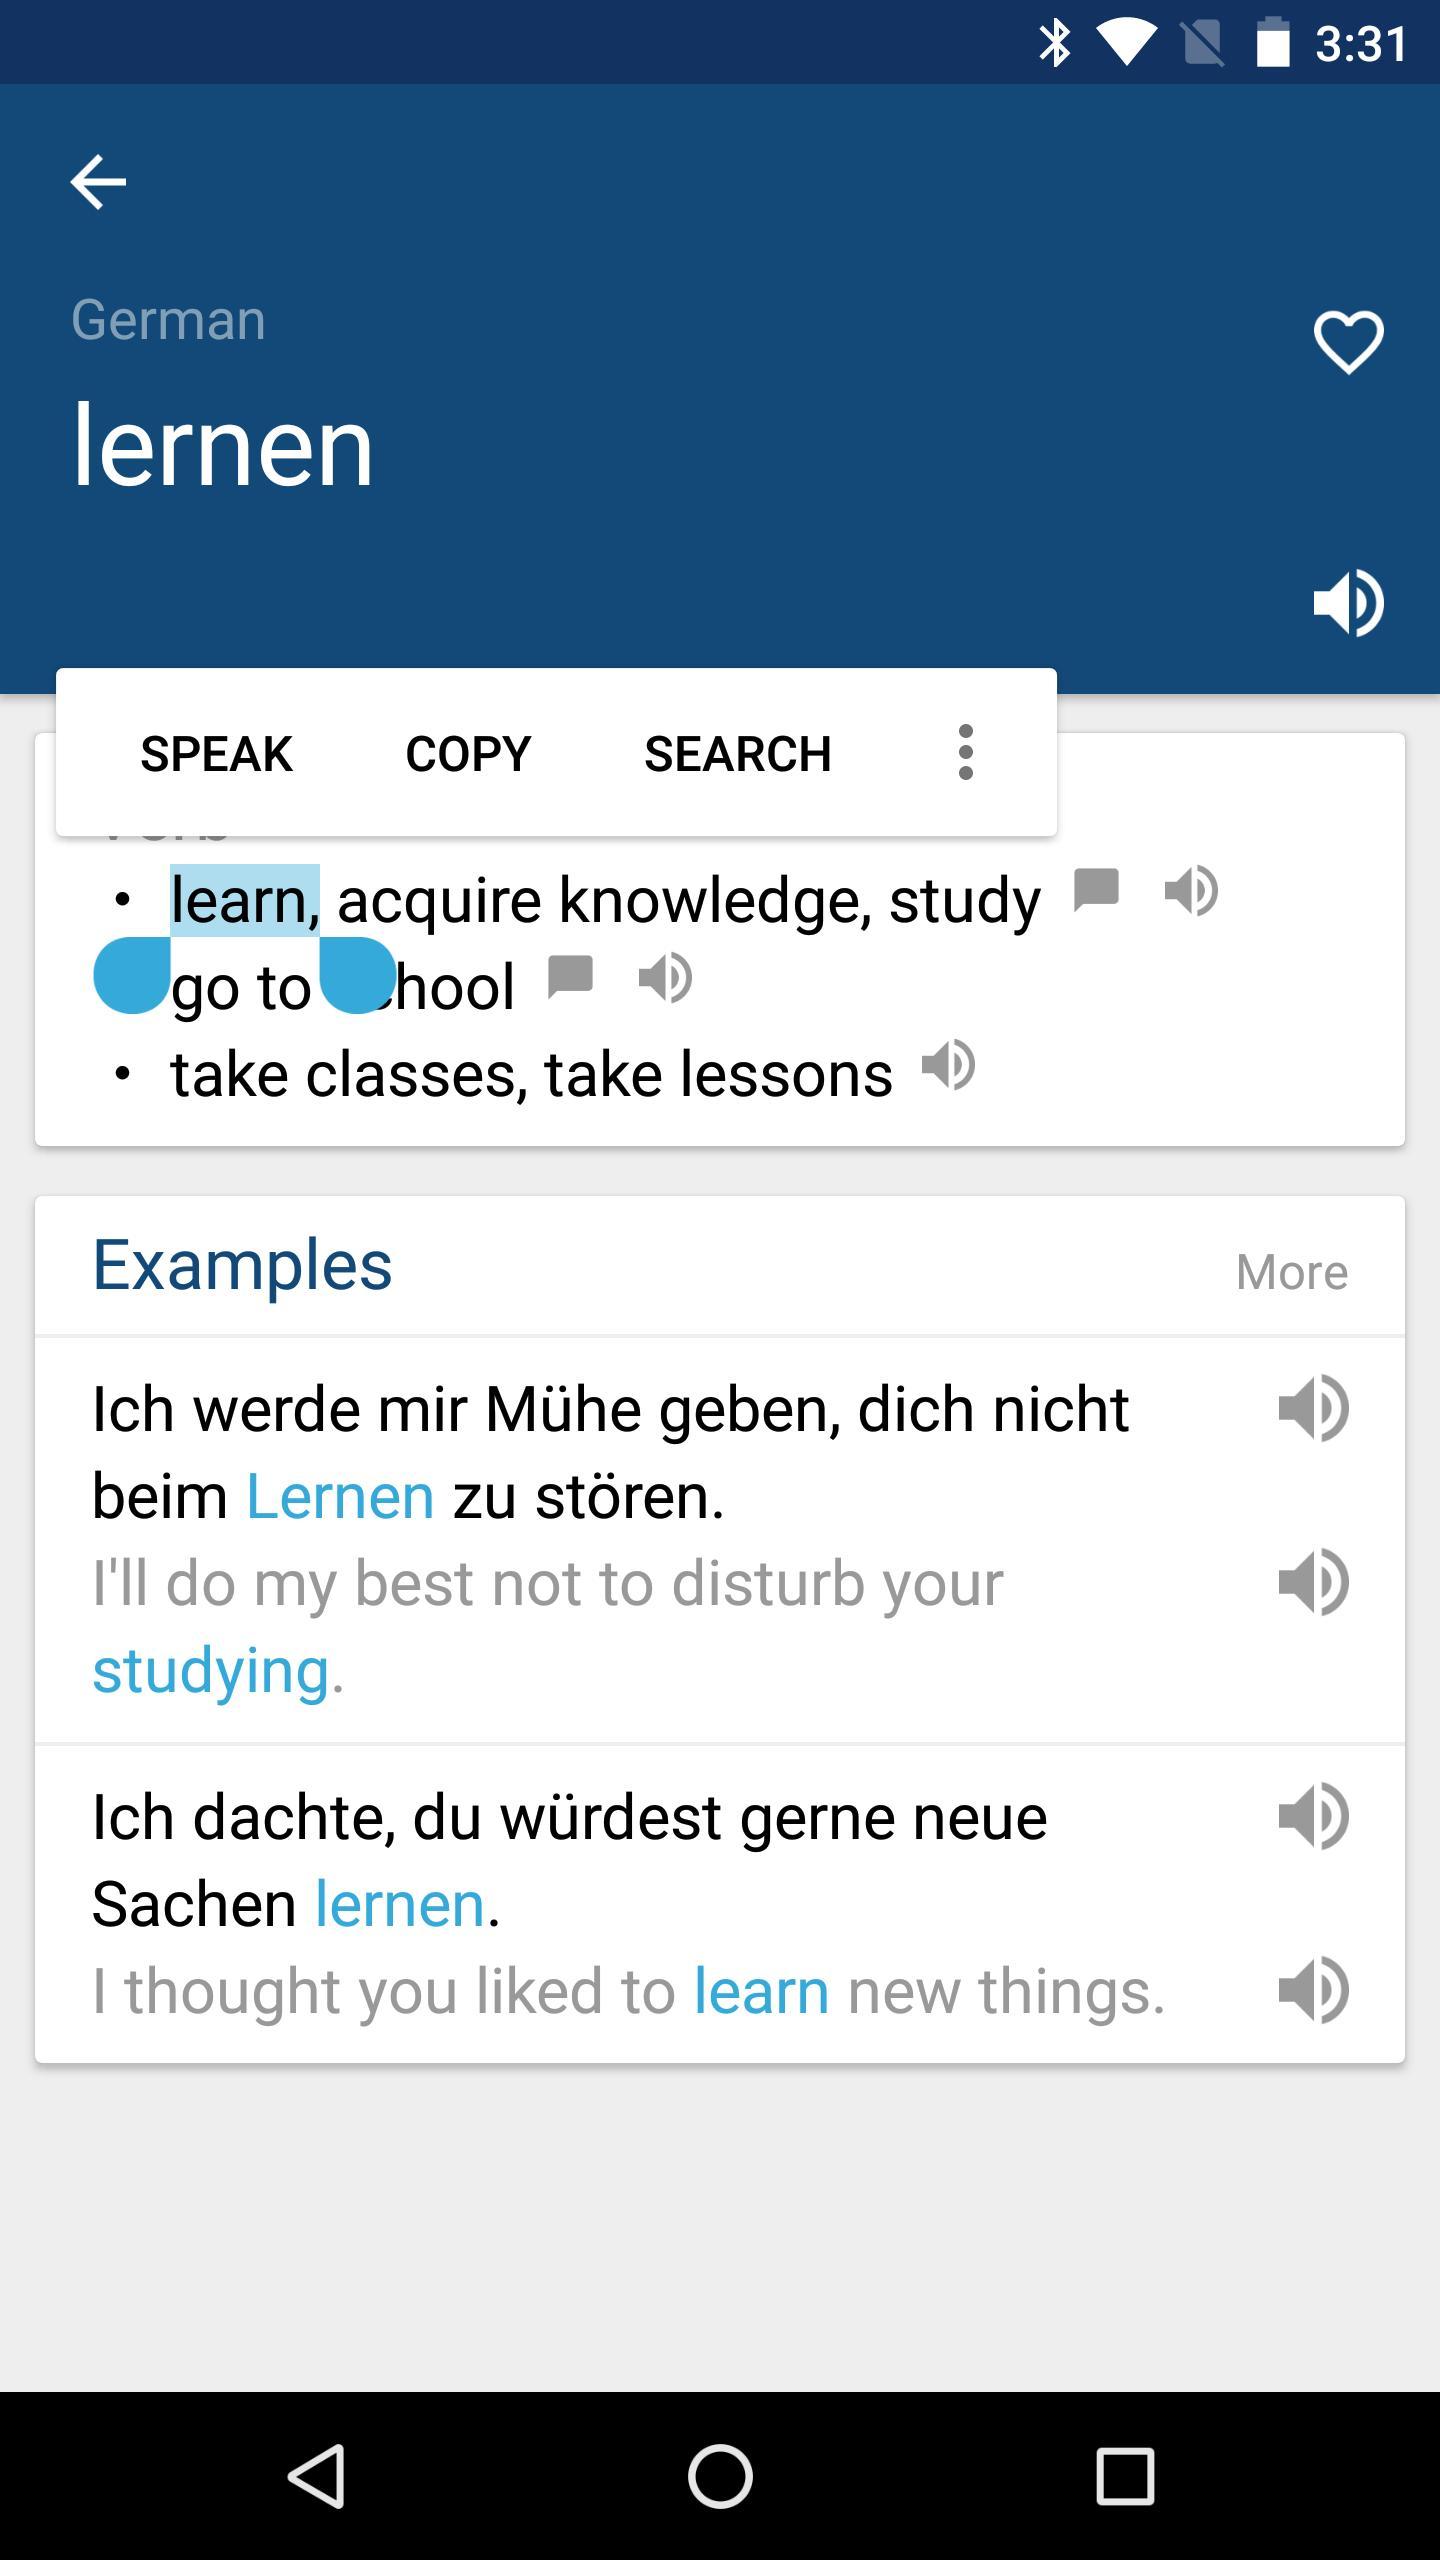 german to english converter software free download